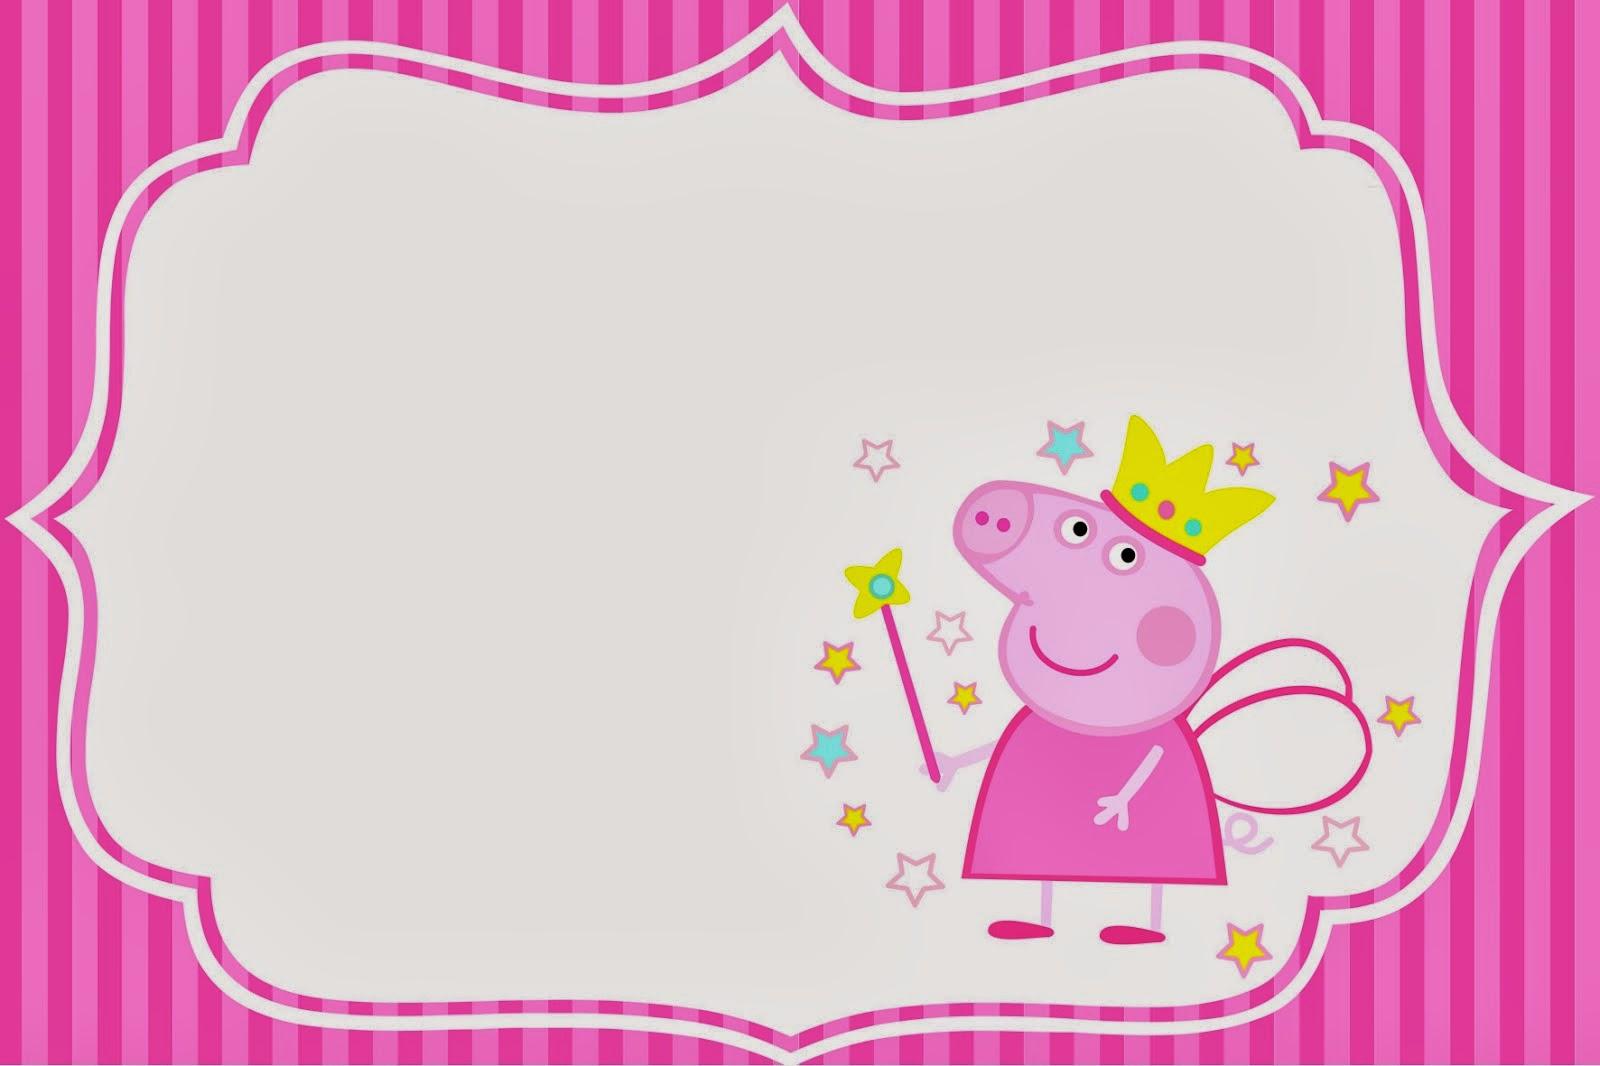 Pig border clipart clip art freeuse Pig Border Free Clipart - Clip Art Library clip art freeuse